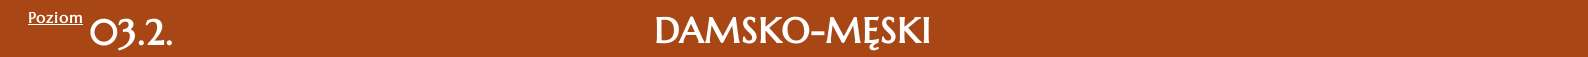 https://optyclub.pl/wp-content/uploads/2018/12/DAMSKO-meski-goto.jpg